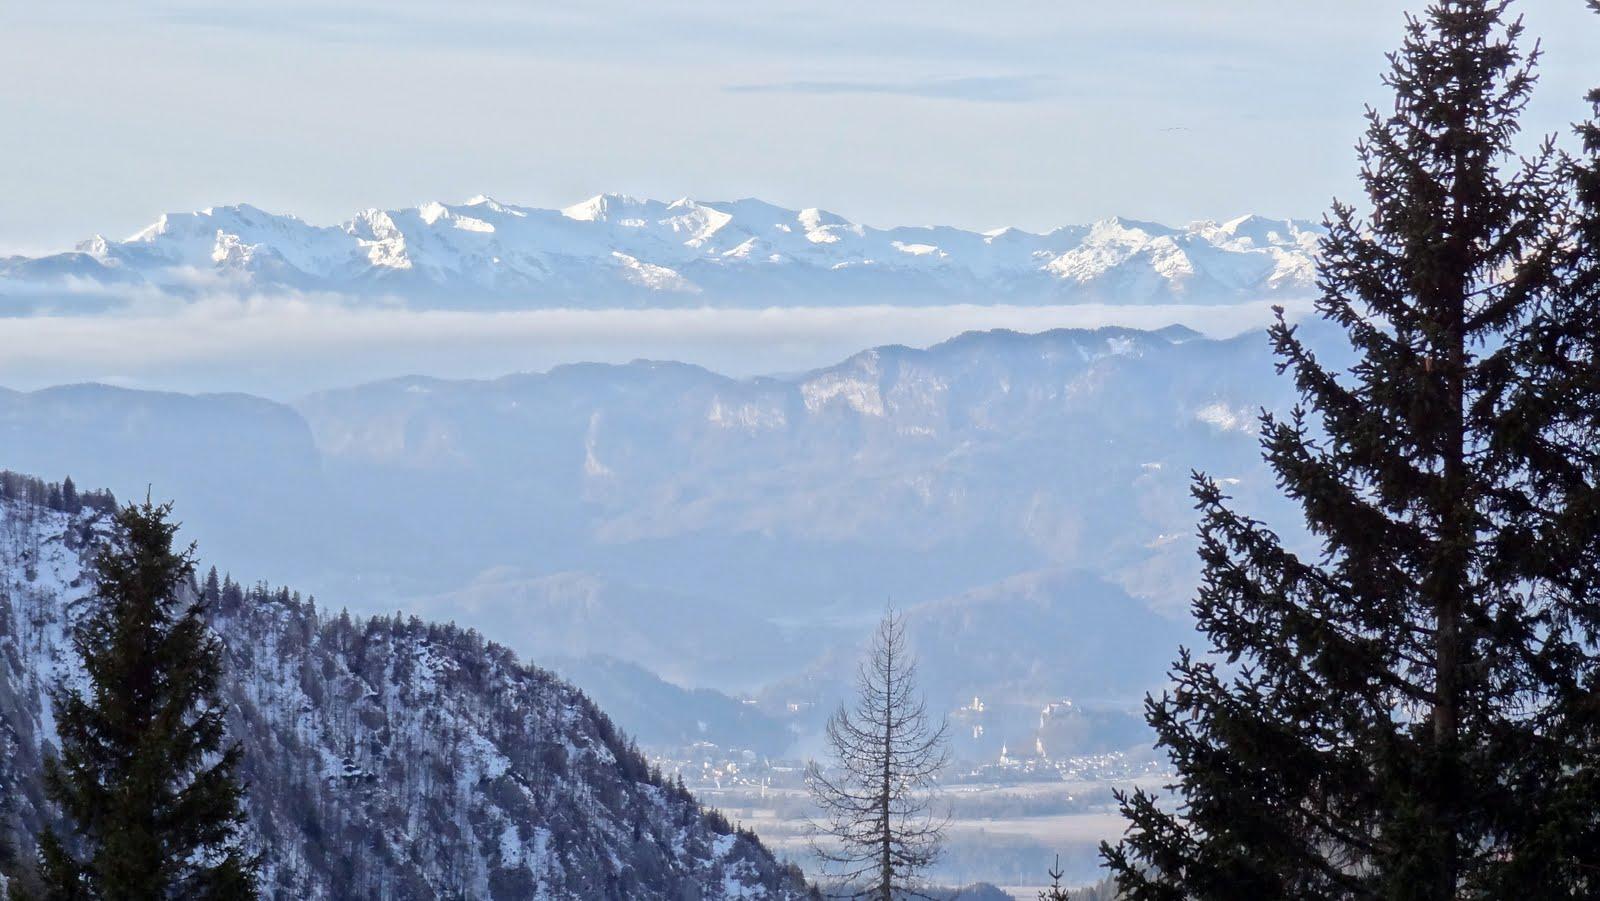 Iza malog bora - Bled